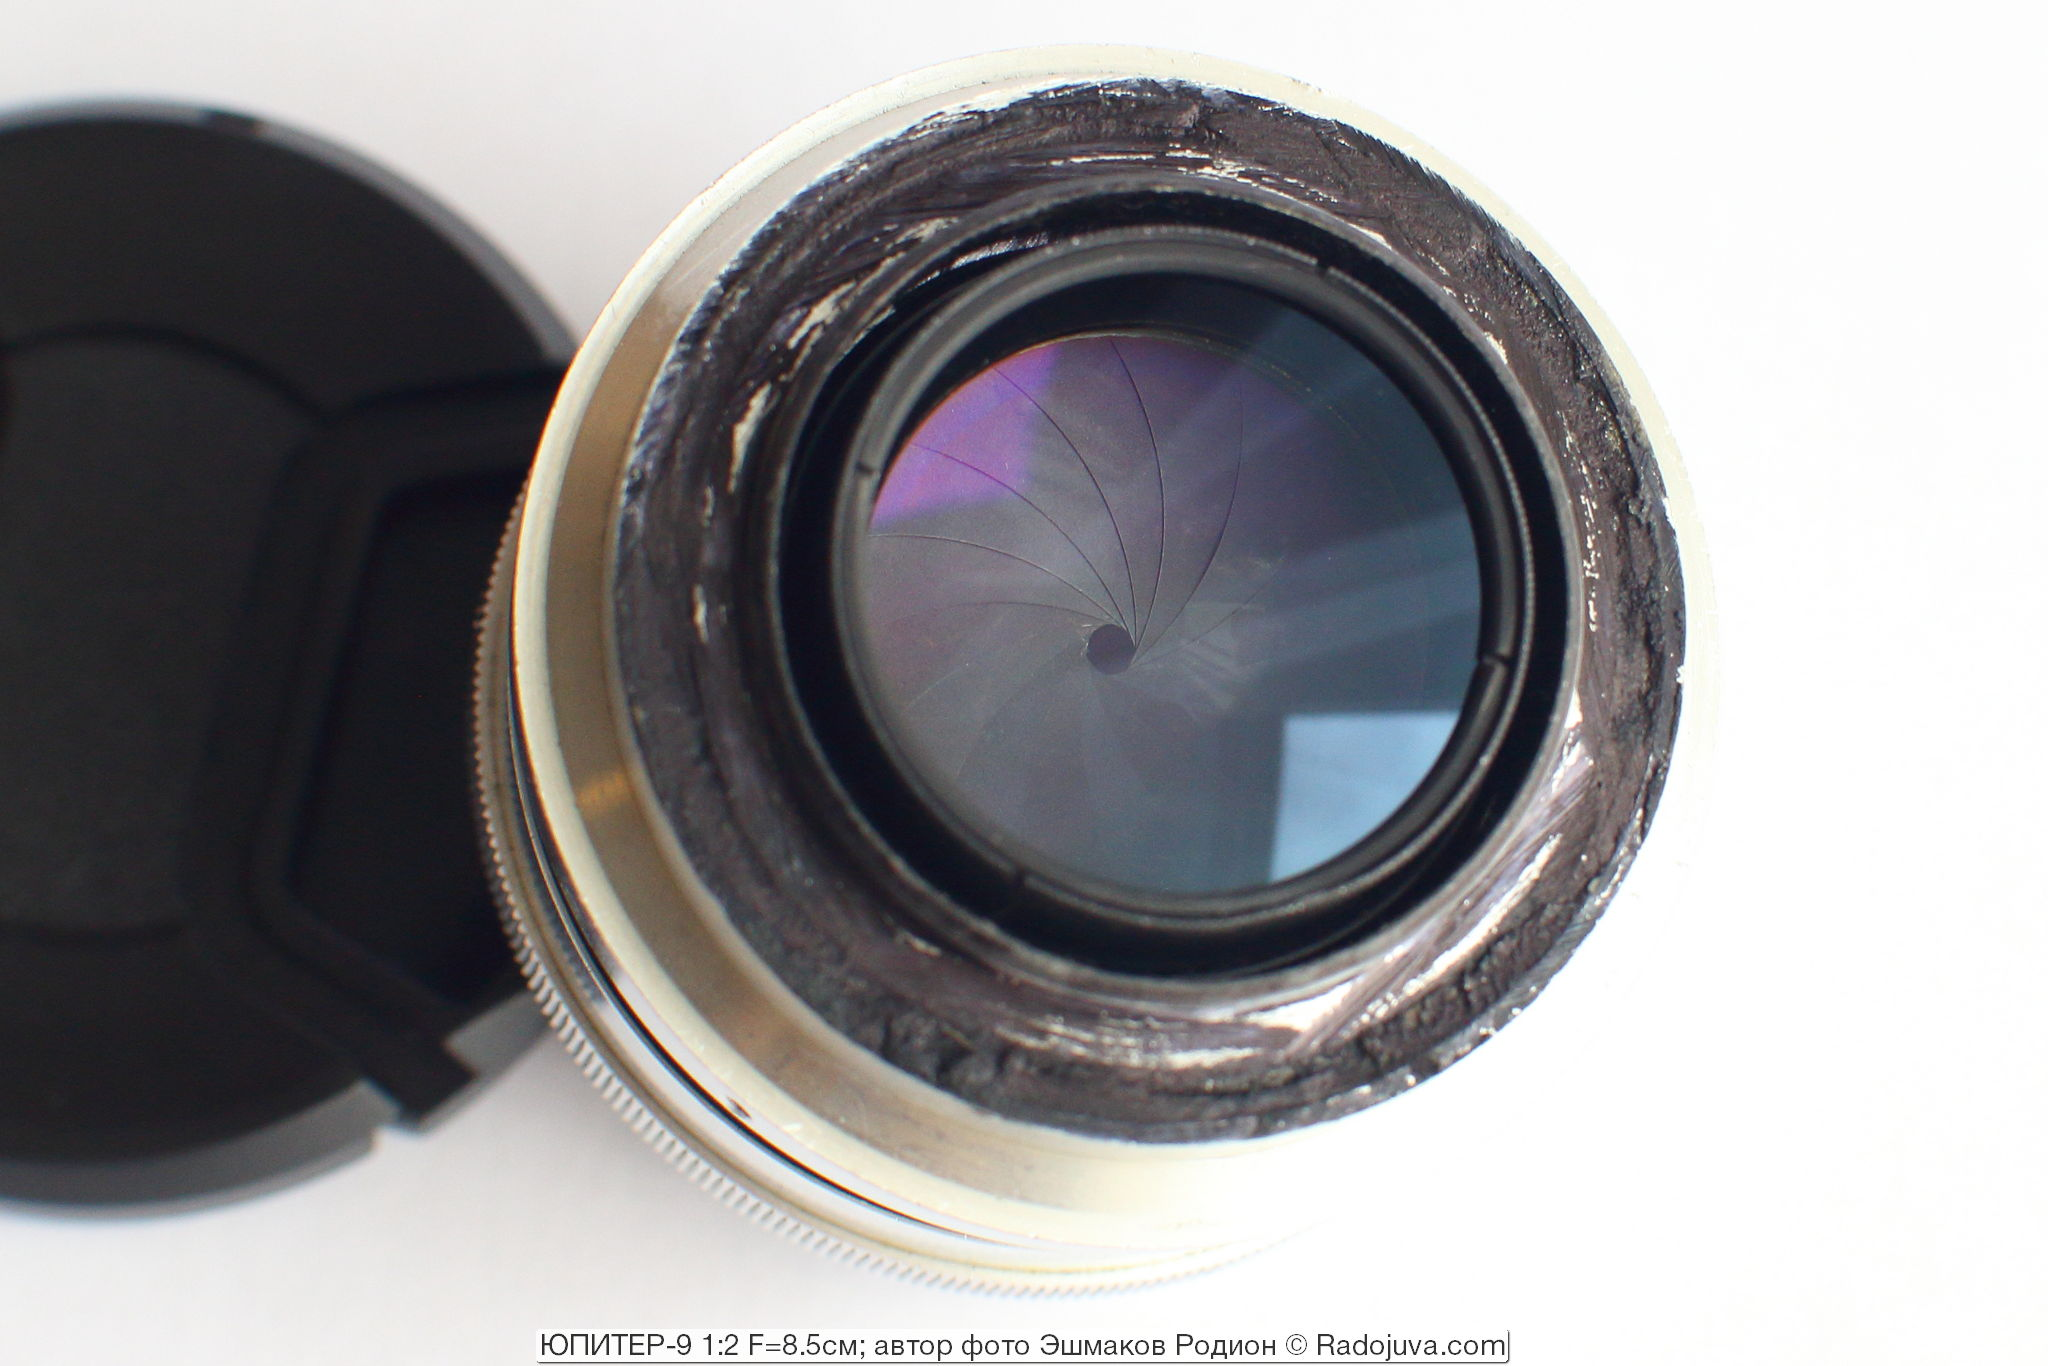 Диафрагма объектива Юпитер-9